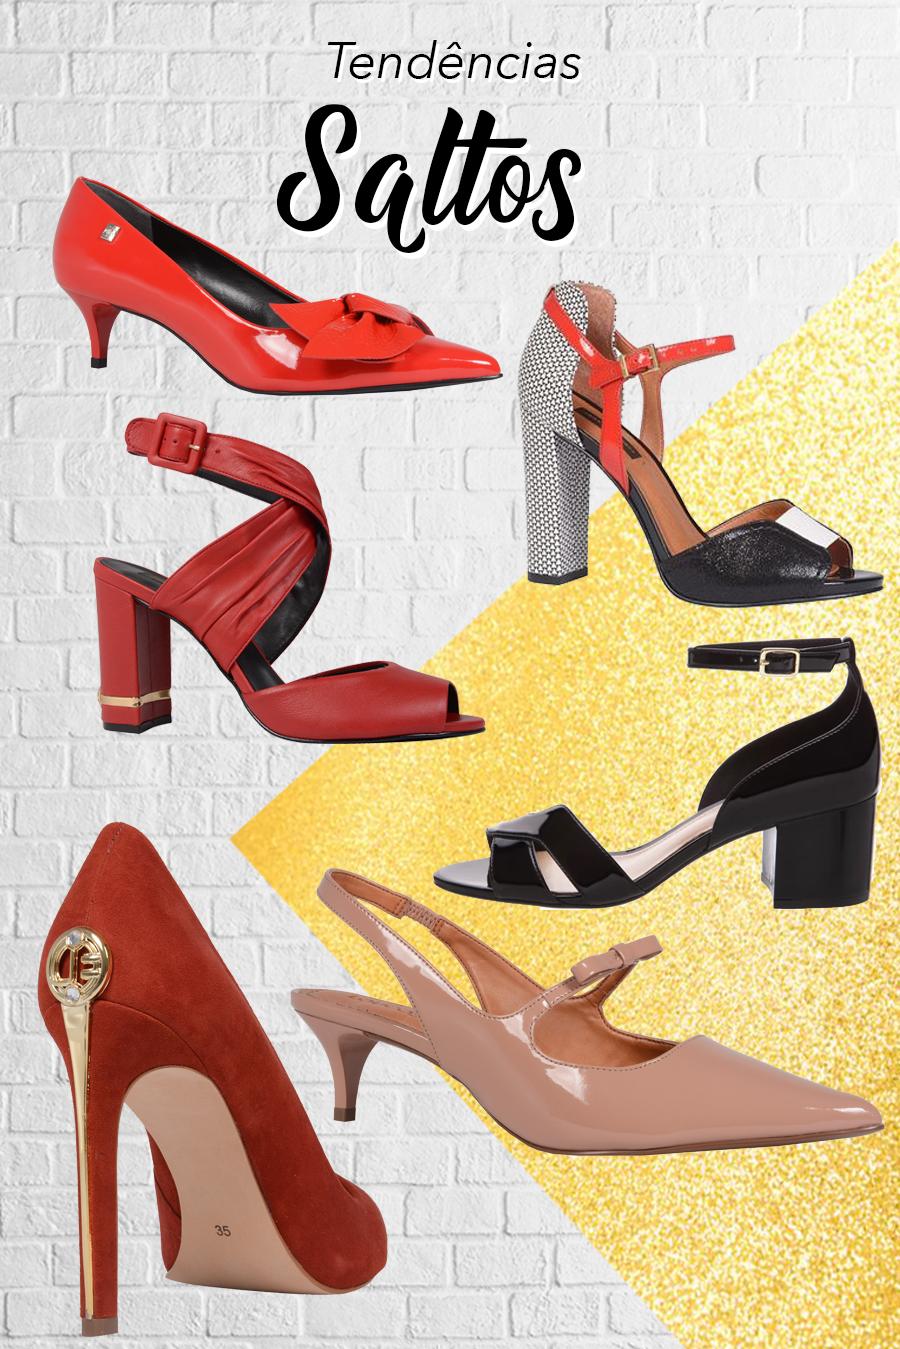 tendencias_sapatos_saltos_inverno